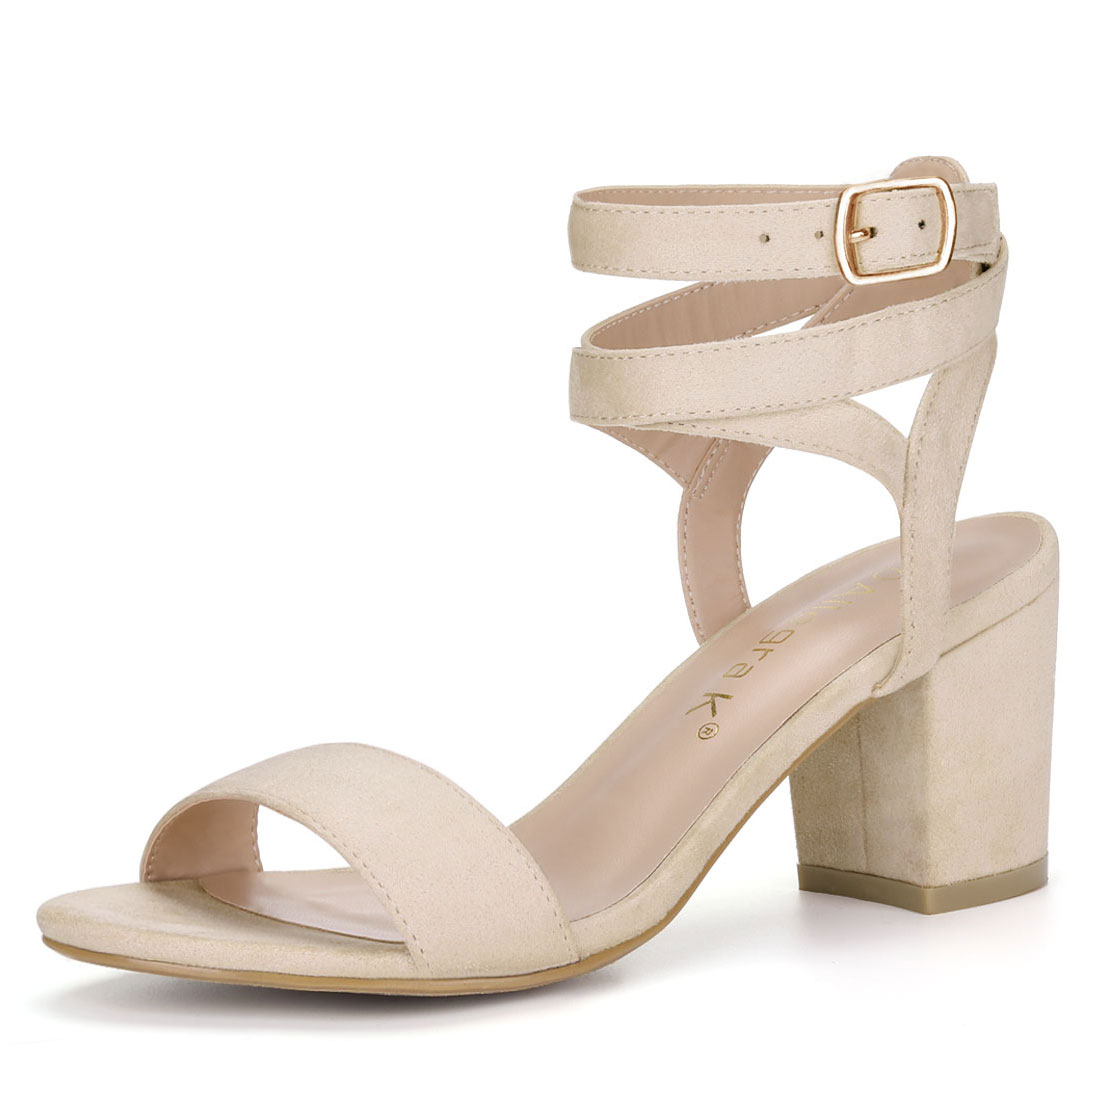 Allegra K Women's Block Heels Double Ankle Straps Sandals BeigeUS 6